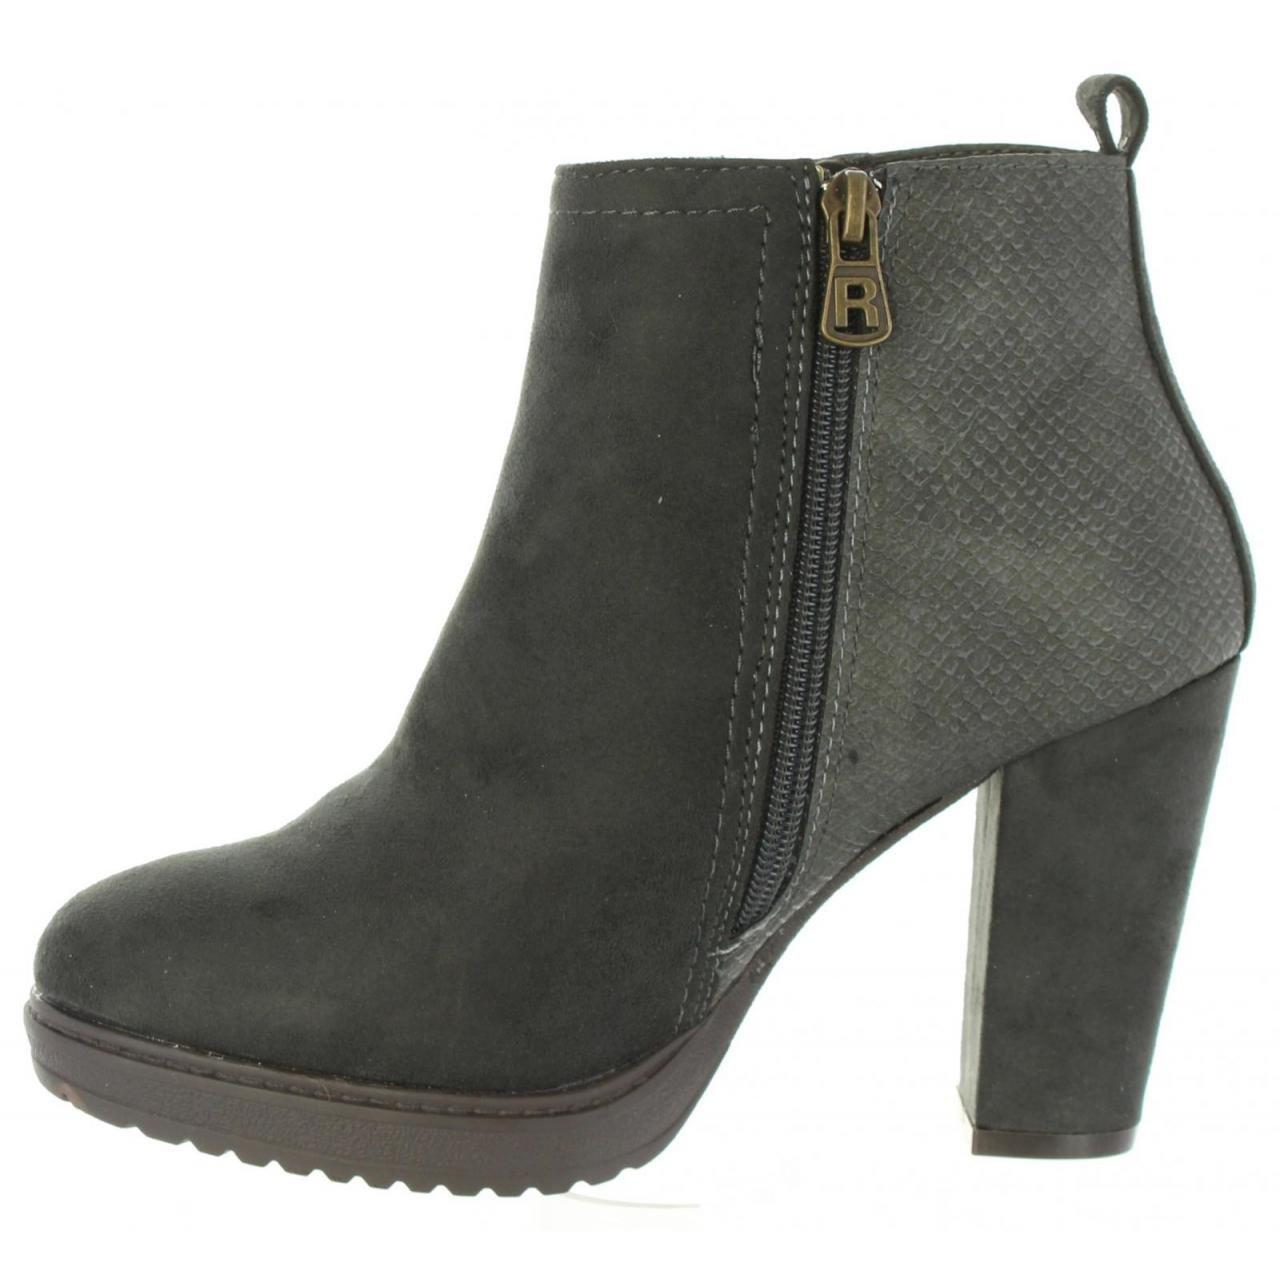 Refresh Stiefel für Damen 63704 63704 63704 C grau 27f770